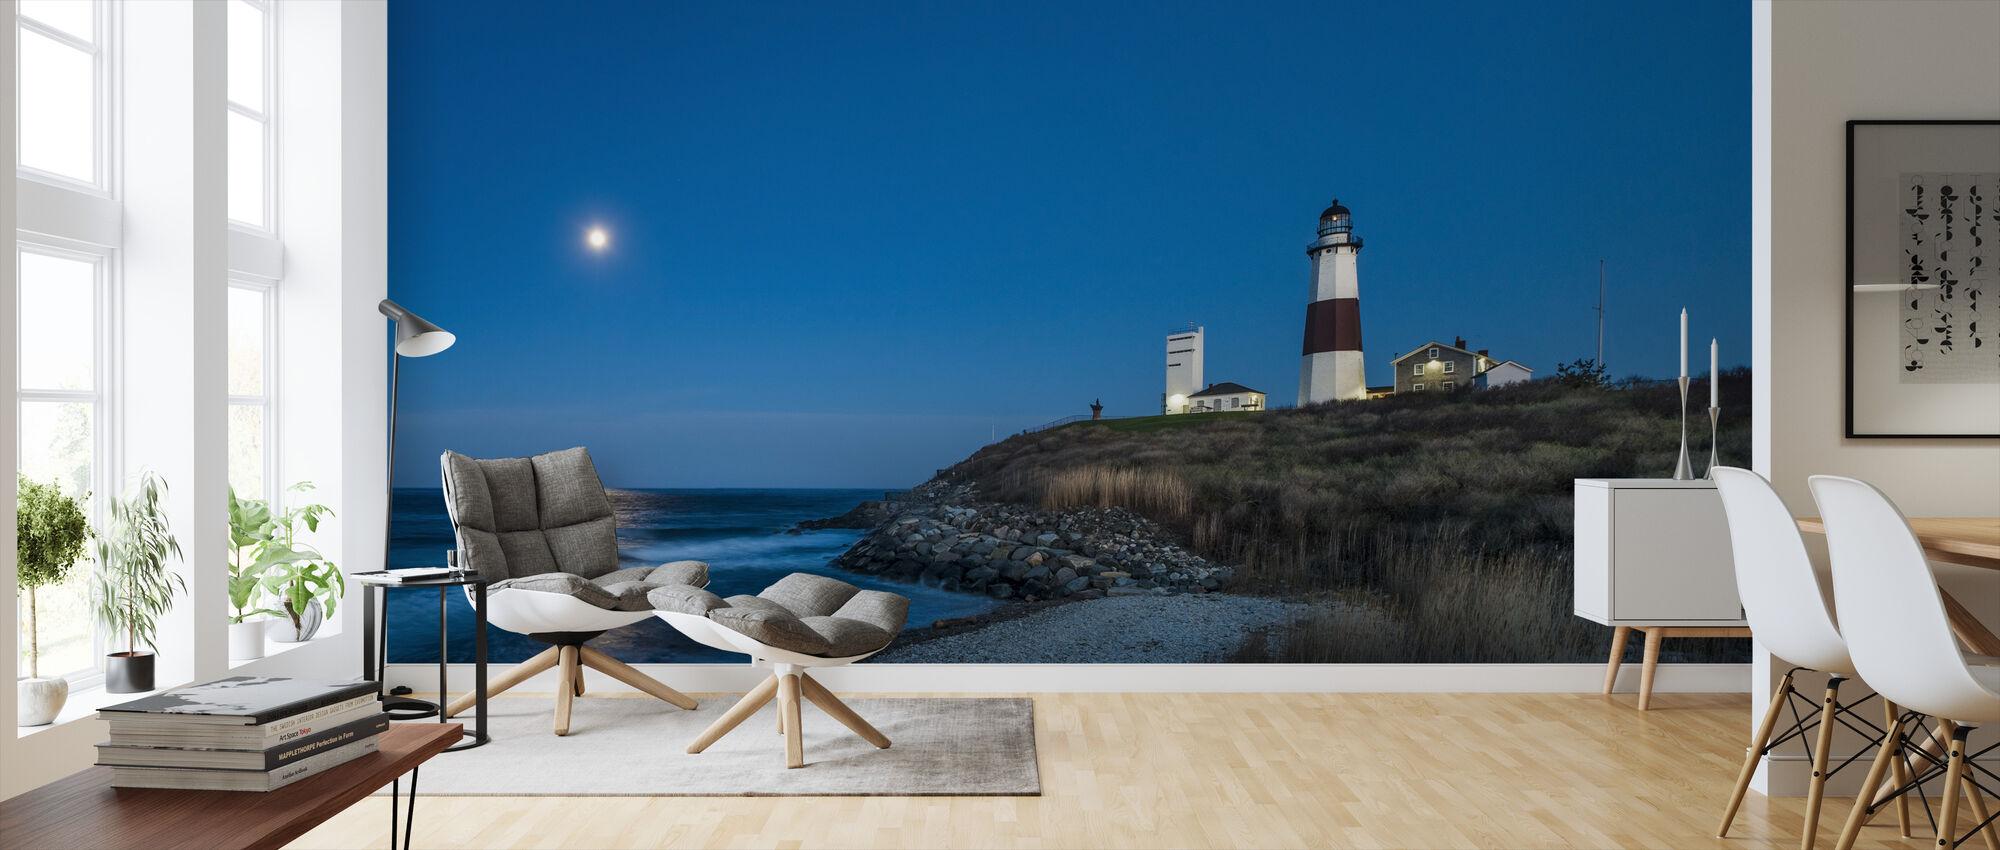 Montauk Point, Long Island - Wallpaper - Living Room